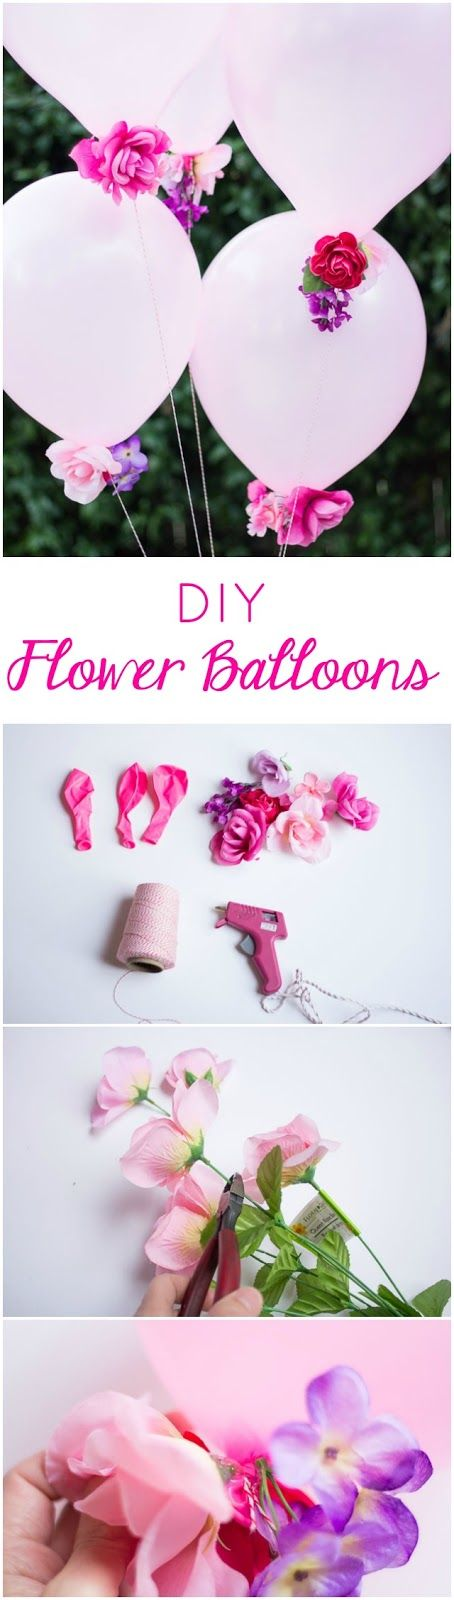 Blumenballons basteln, Fotohintergrund basteln, Ballon Deko, DIY Party Dekoideen zum selber machen, Partydeko Ideen, Party dekorieren, Geburtstagsparty Deko, Deko selber machen,